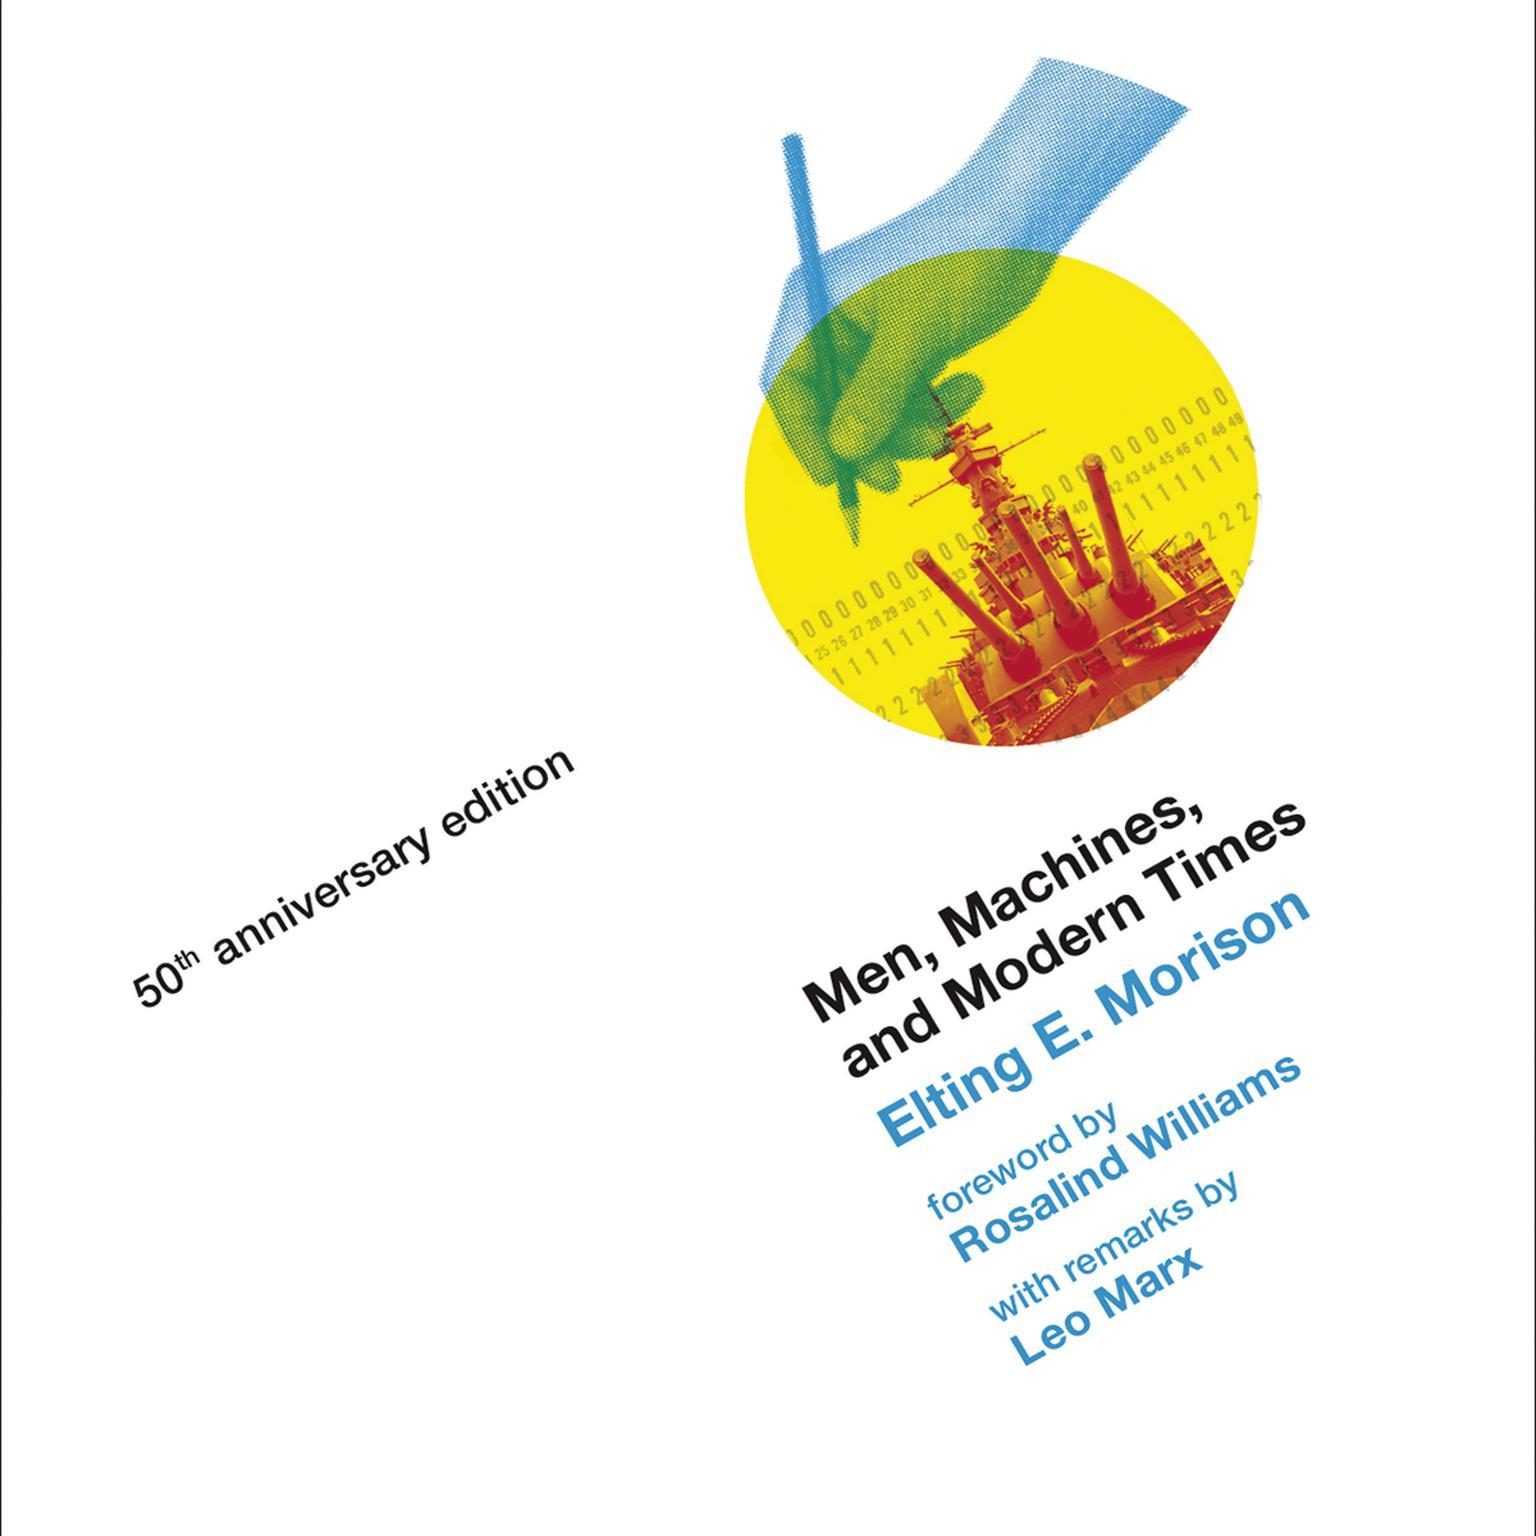 Men, Machines, and Modern Times, 50th Anniversary Edition: 50th Anniversary Edition Audiobook, by Elting E. Morison